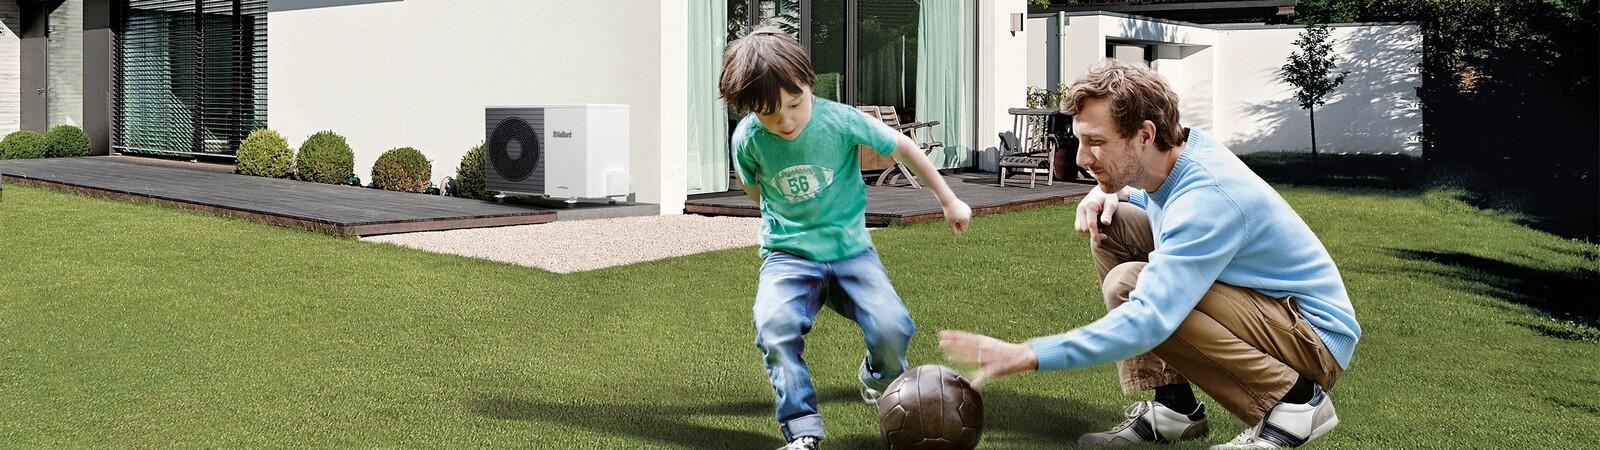 Spelend kind met vader en aroTHERM split warmtepomp op achtergrond